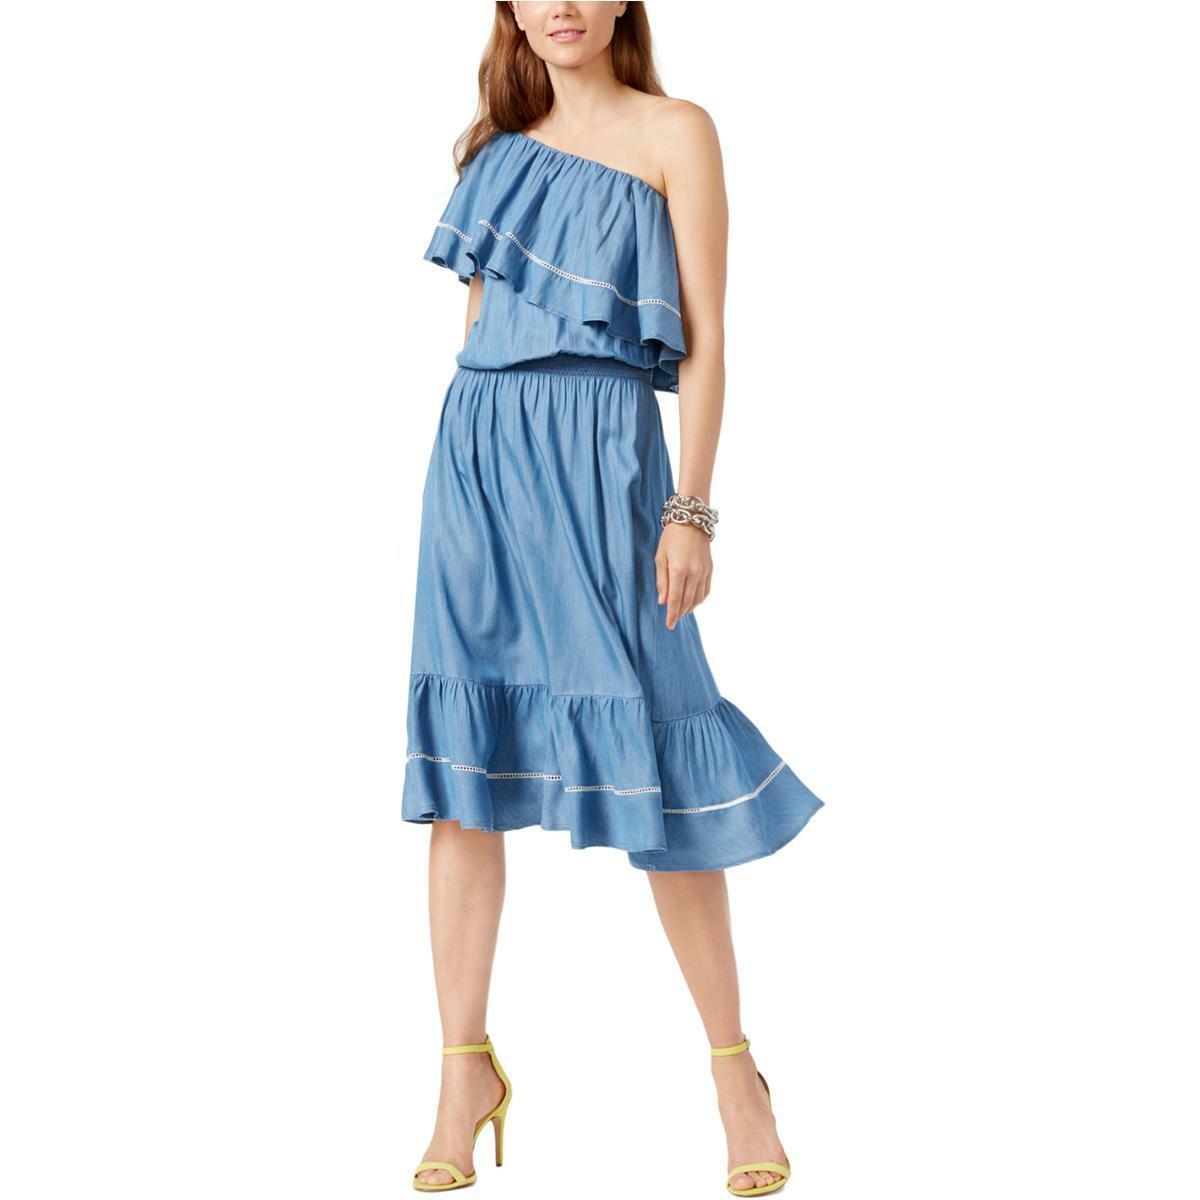 INC Womens Blue Denim One Shoulder Summer Casual Dress XL BHFO 9789